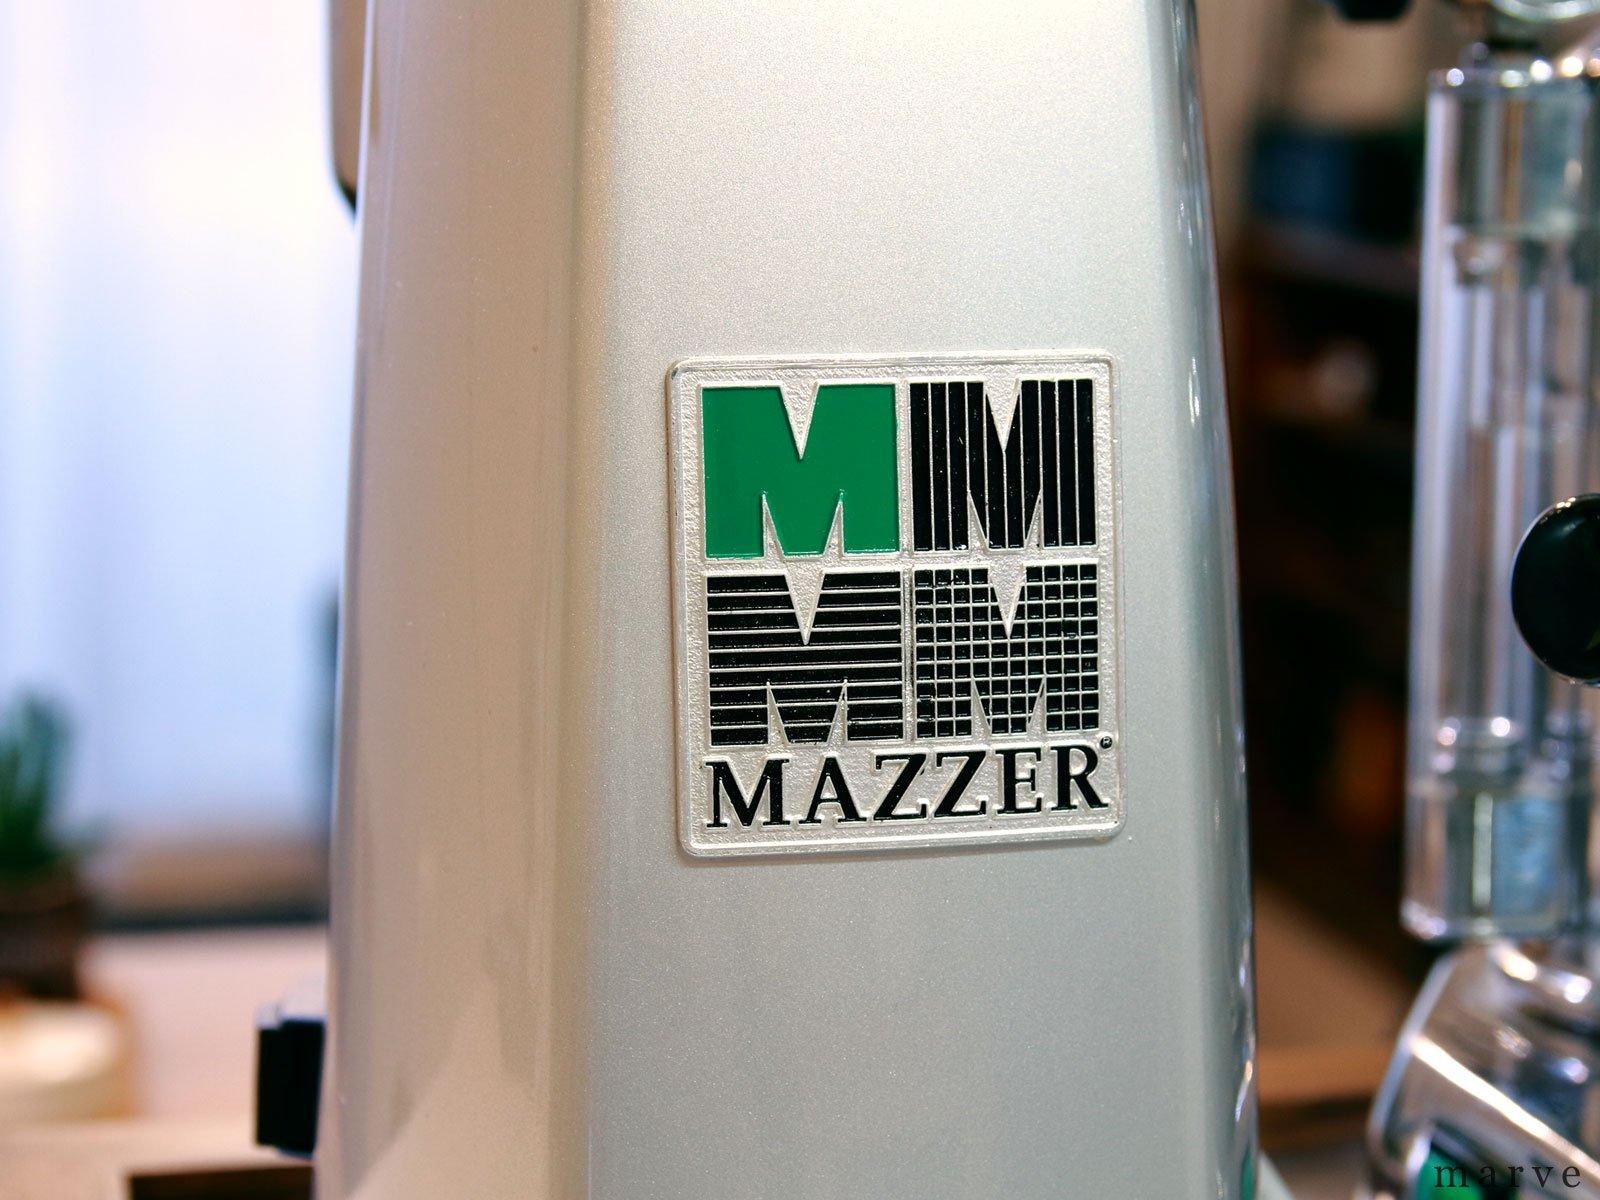 MAZZER(マッツァ)グラインダー MINI - ELECTRONIC(A) アルミノ<img class='new_mark_img2' src='https://img.shop-pro.jp/img/new/icons16.gif' style='border:none;display:inline;margin:0px;padding:0px;width:auto;' />